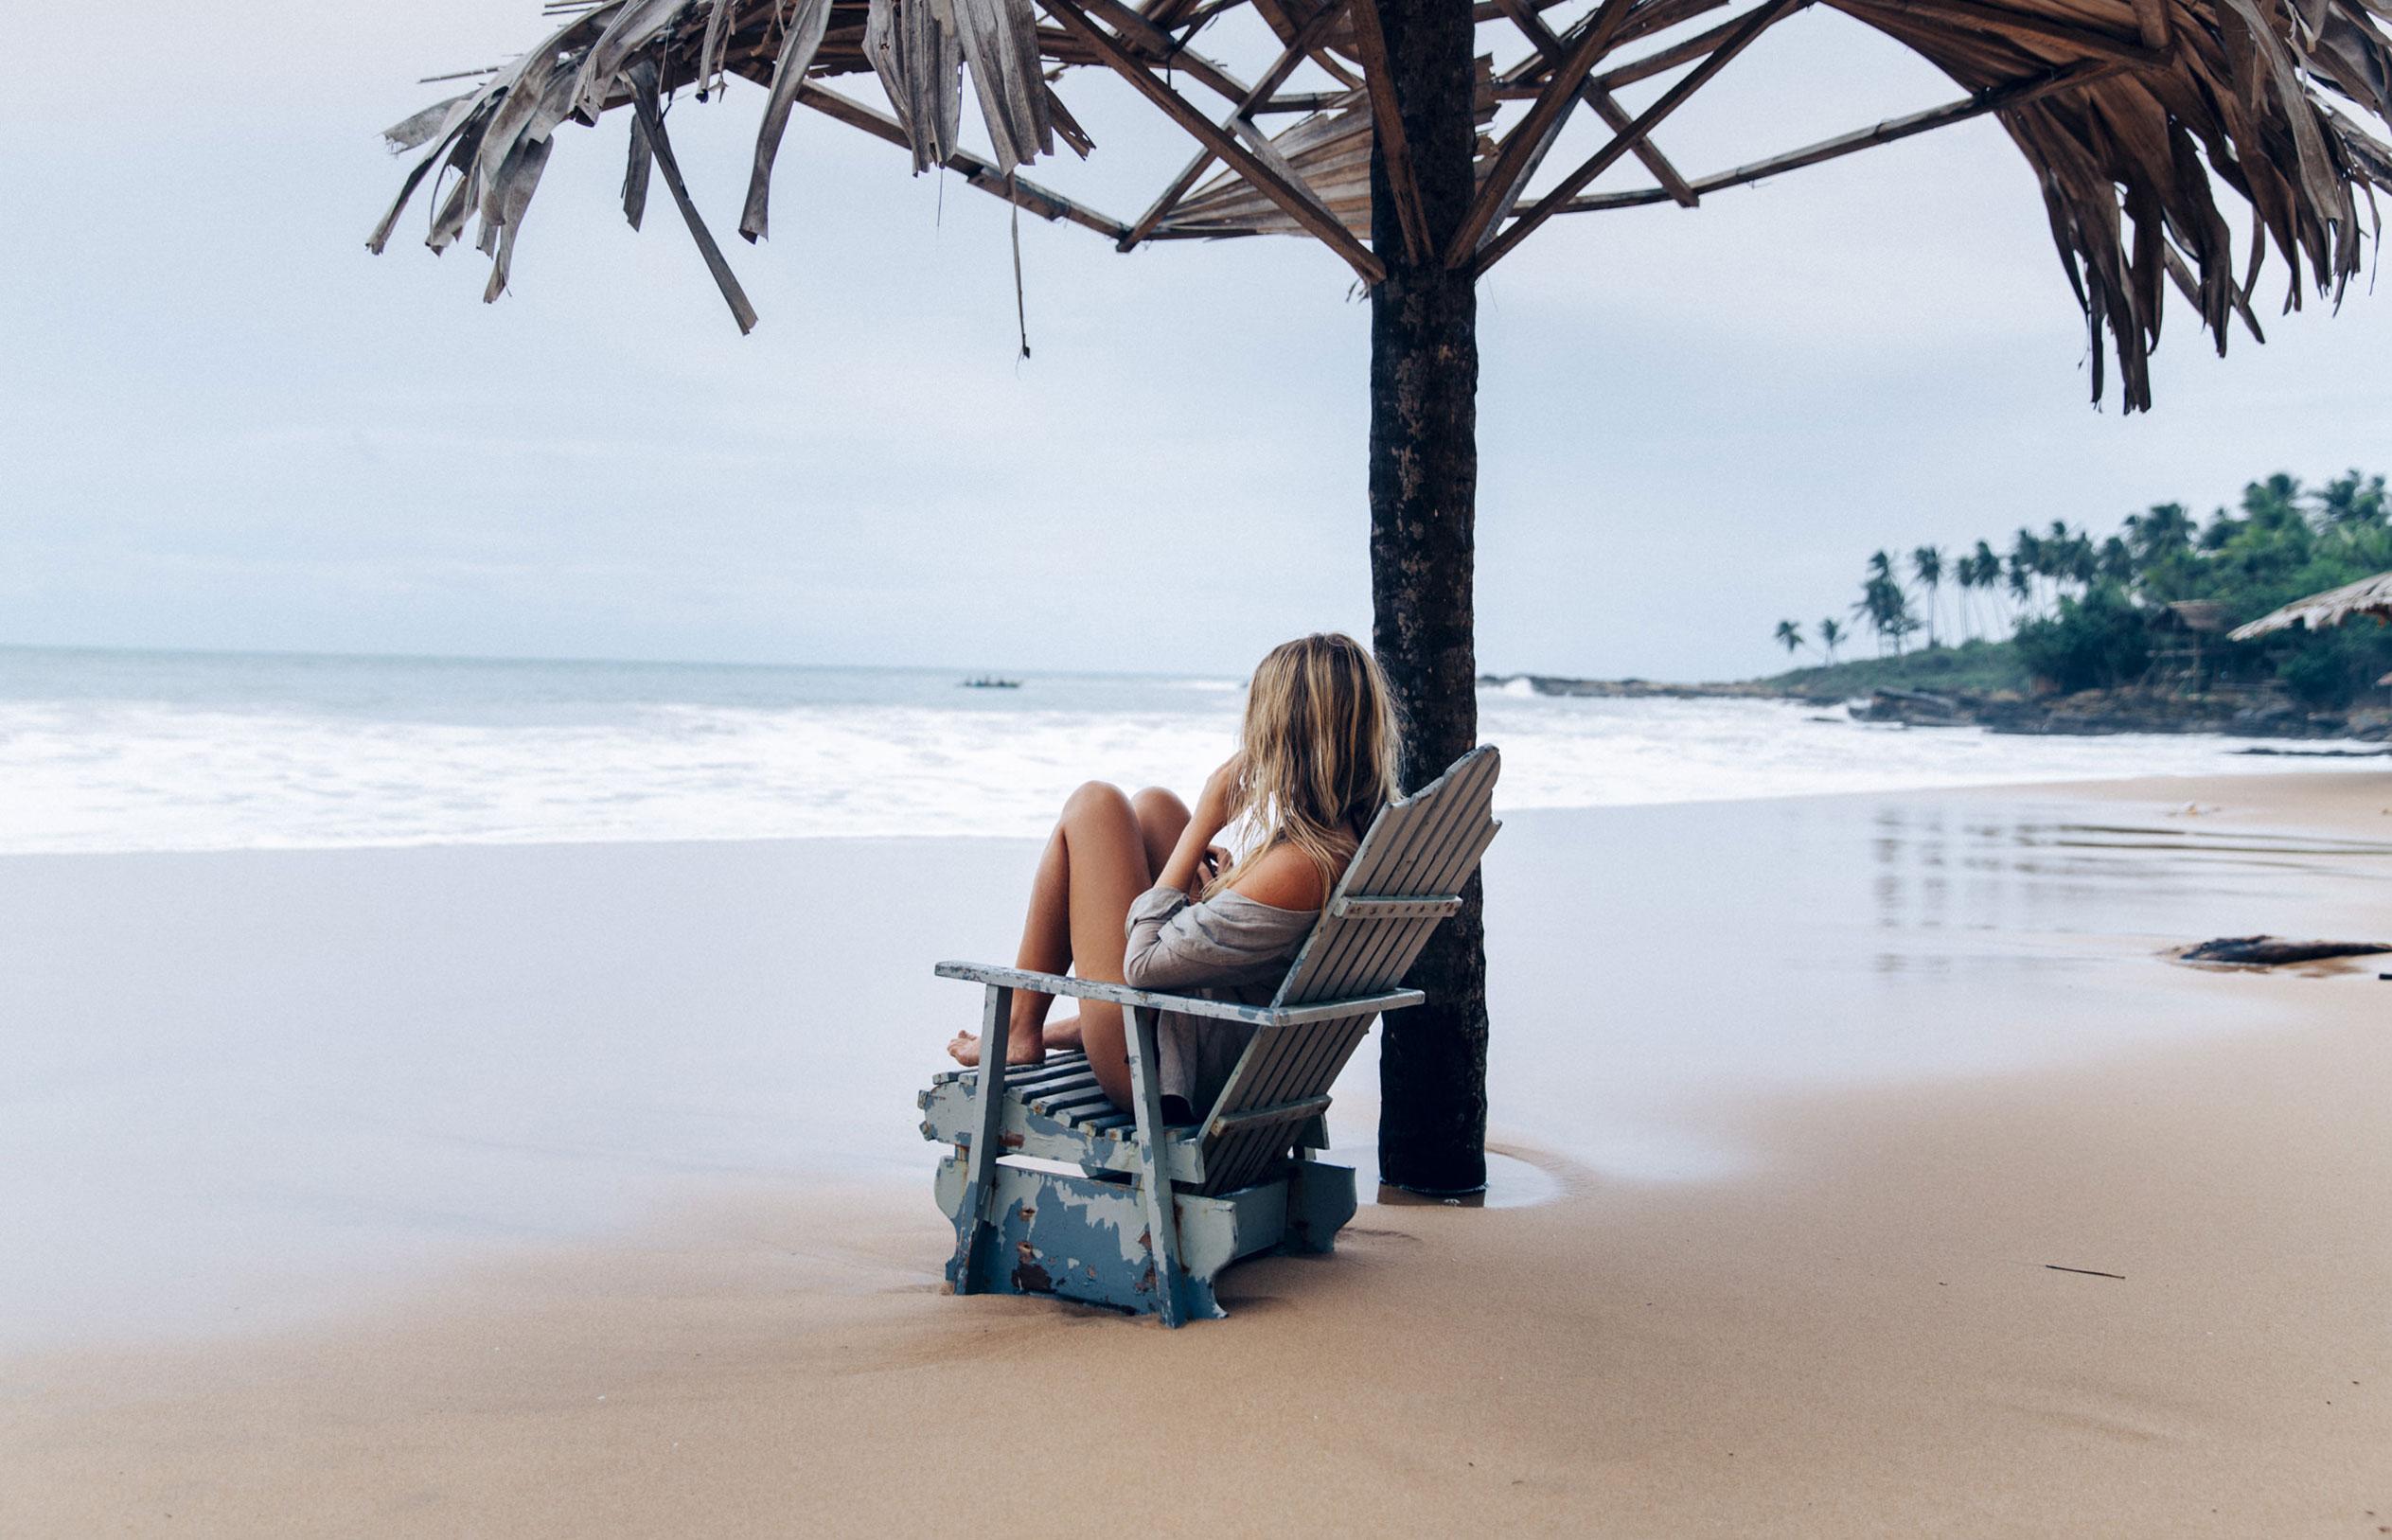 Пляж на Шри-Ланке после шторма / фото 01